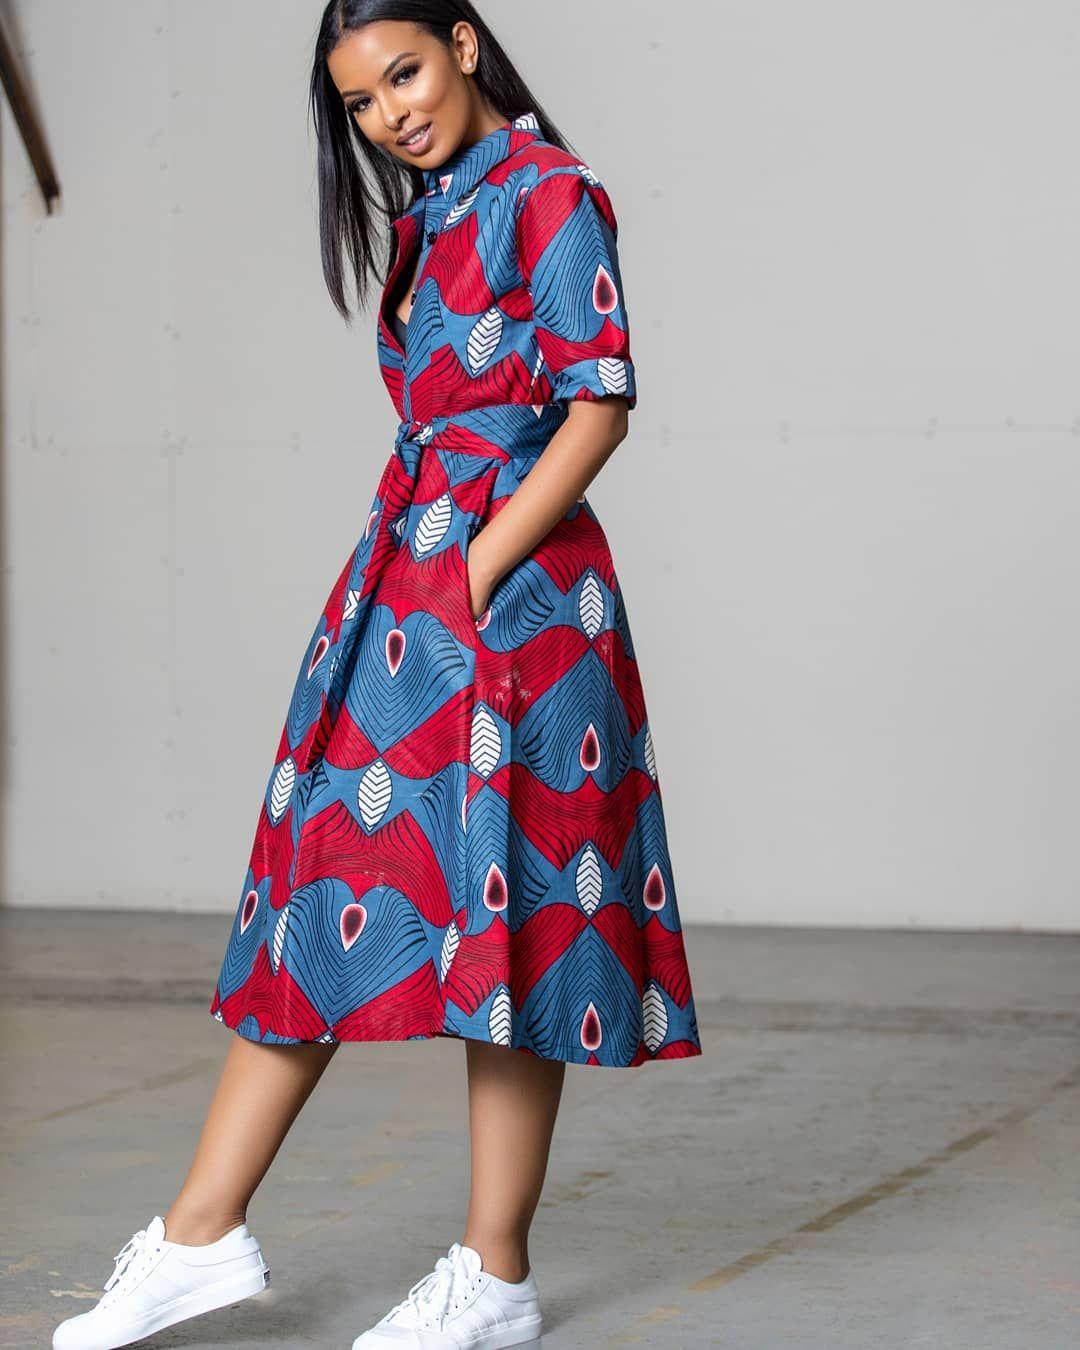 Short african dresses, African attire